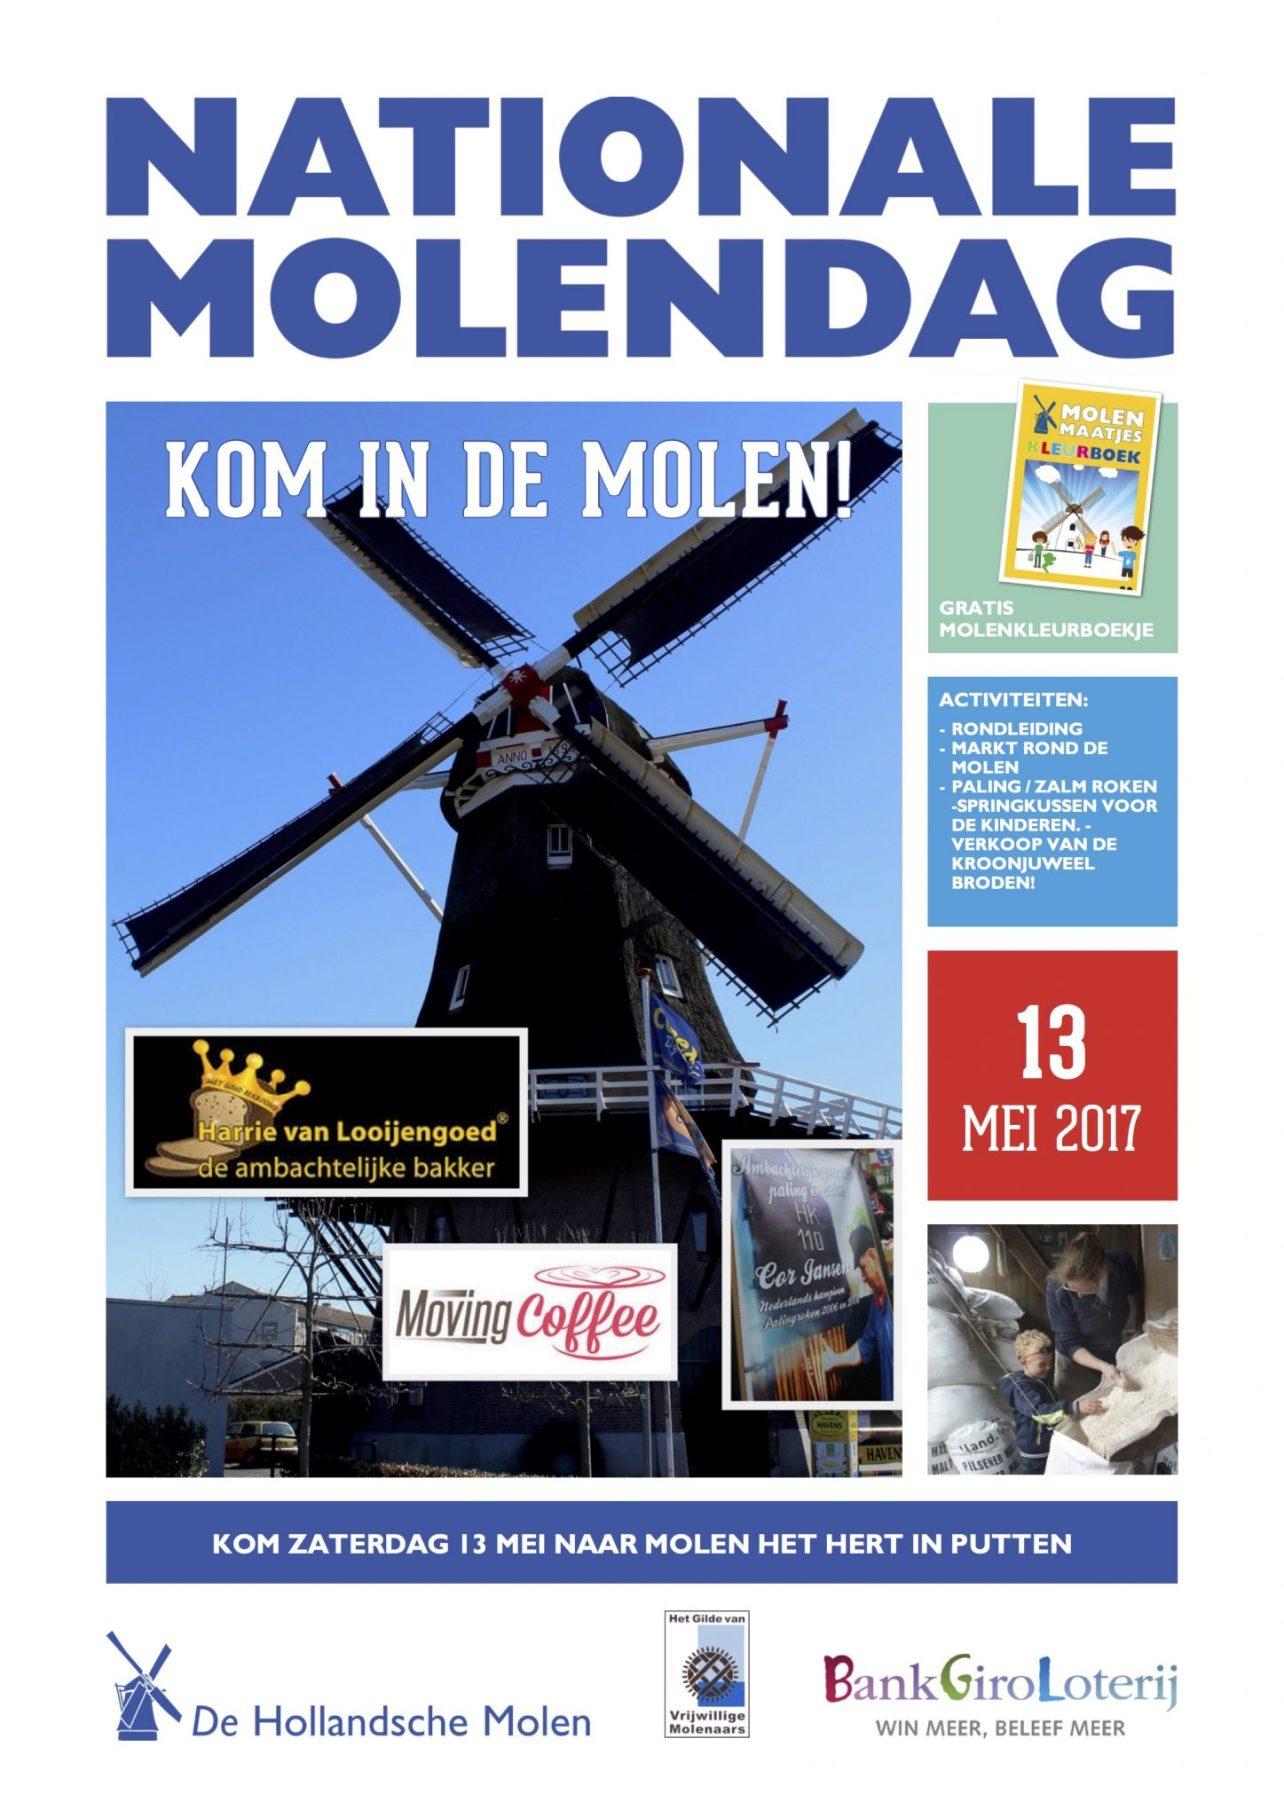 Molendag 2017